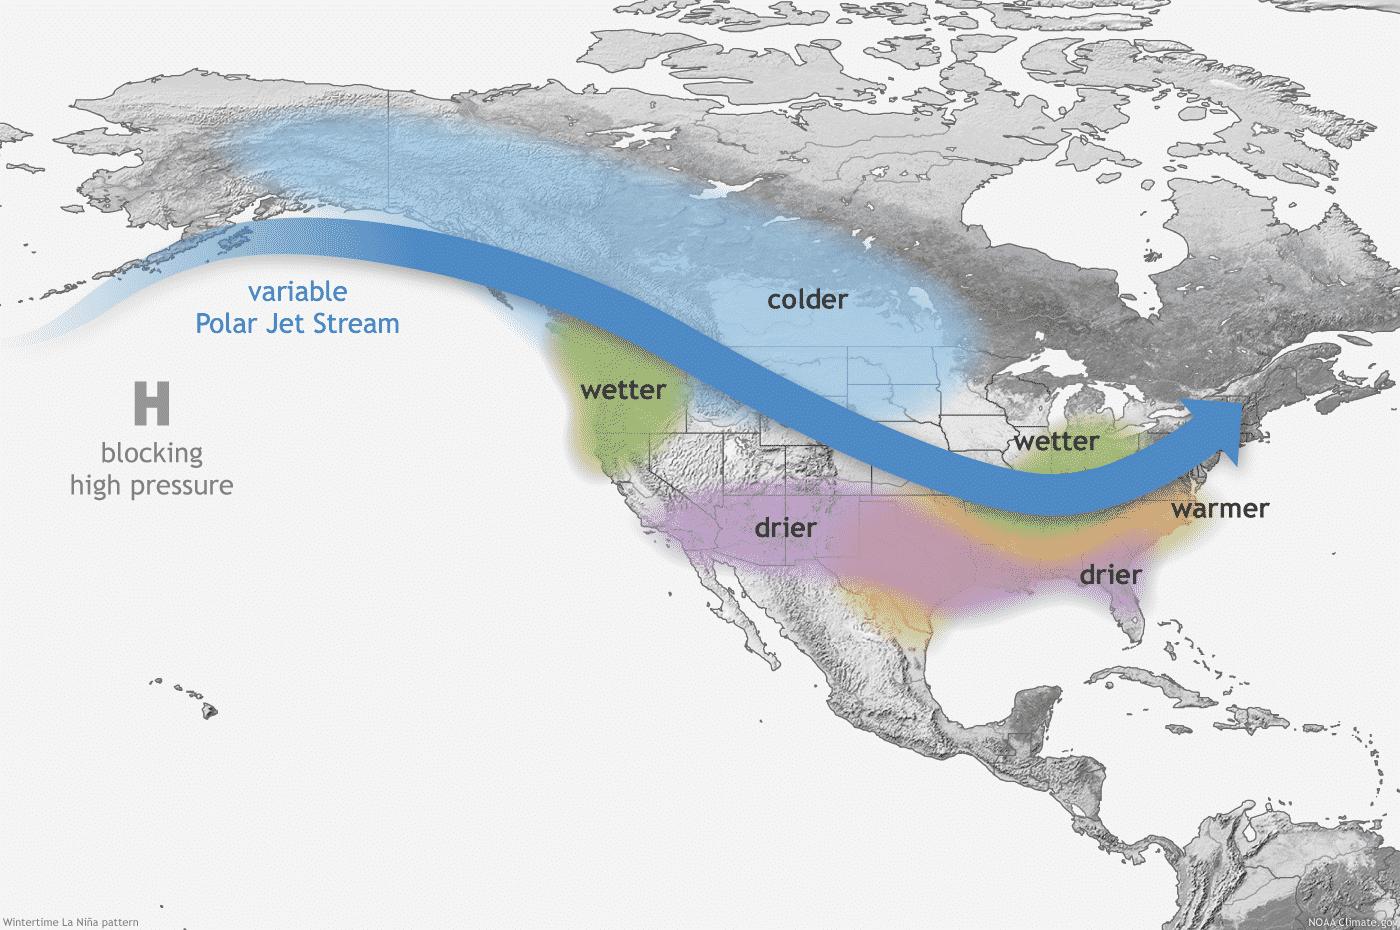 tornado-season-april-spring-2021-forecast-la-nina-pattern